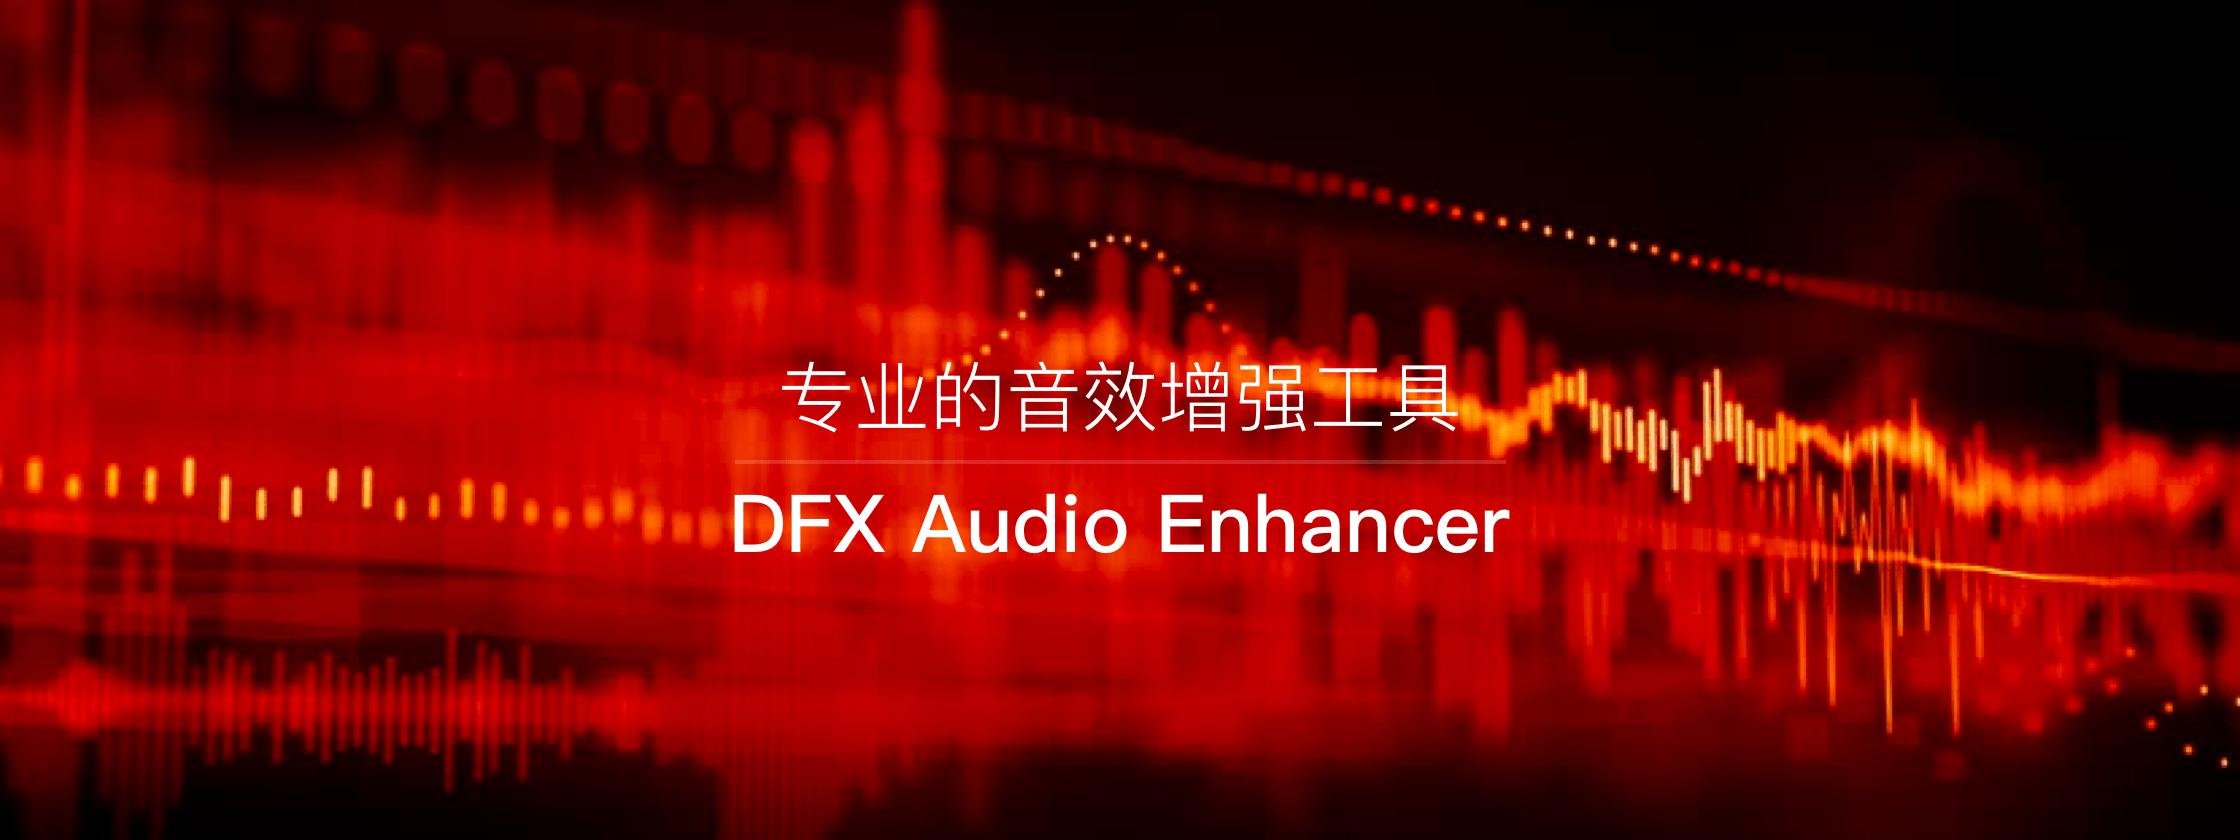 DFX Audio Enhancer – 专业的音效增强工具